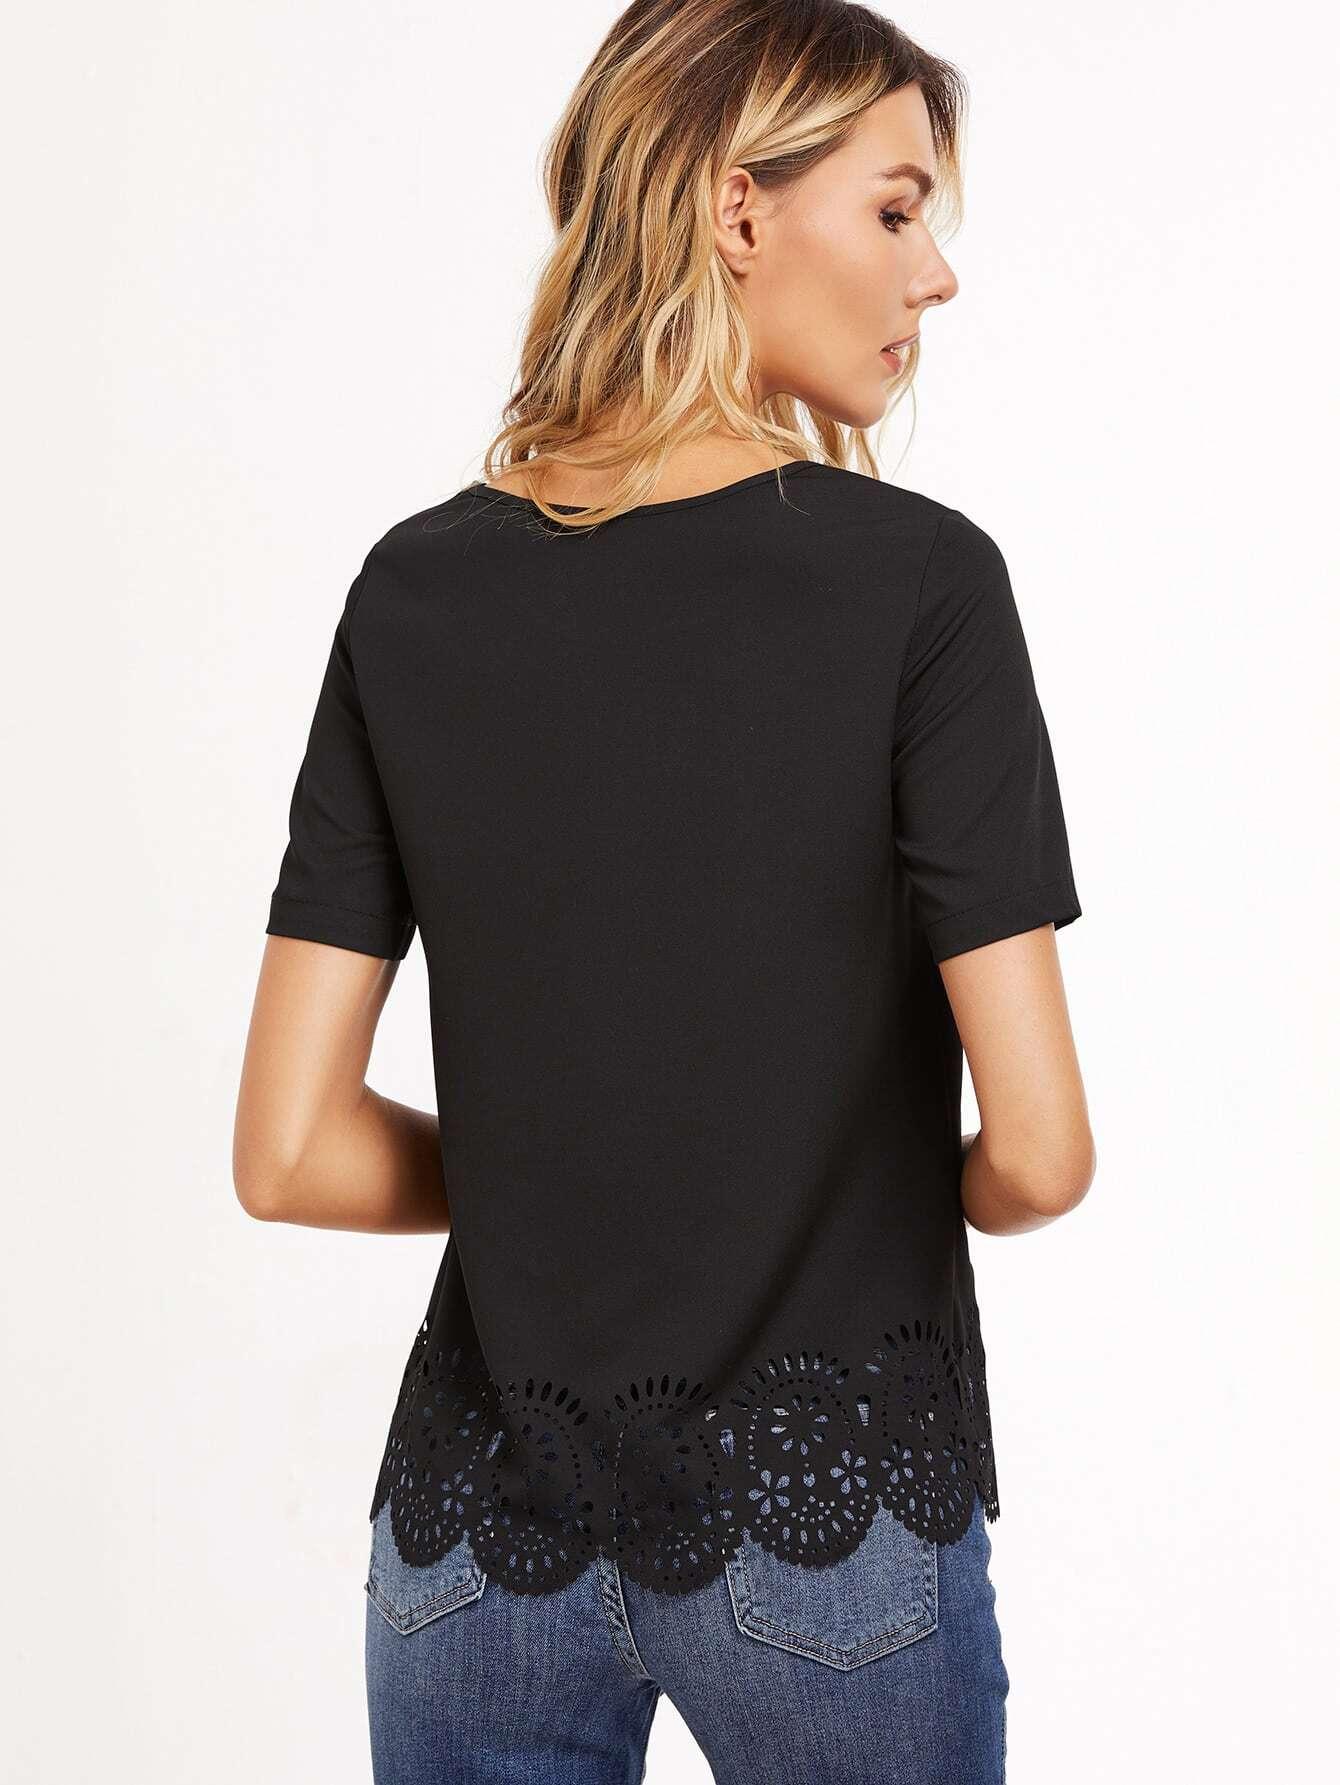 blouse161118704_2